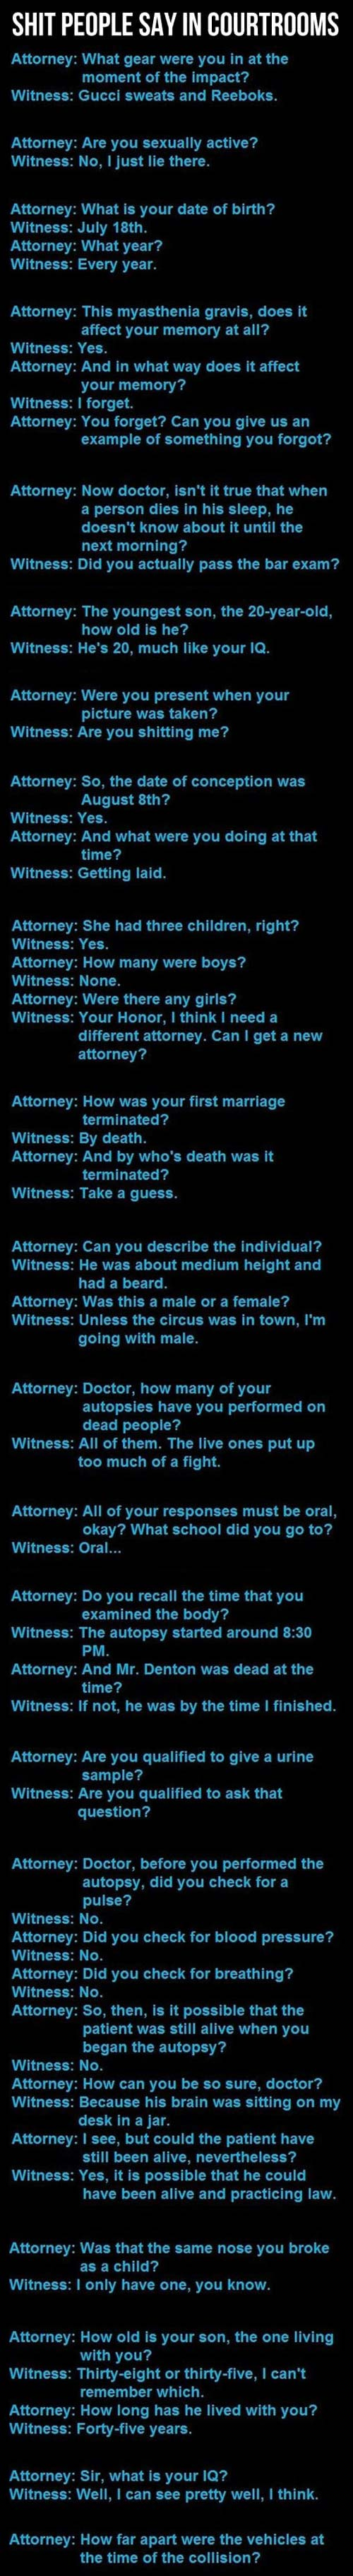 funny-dumb-questions-attorney